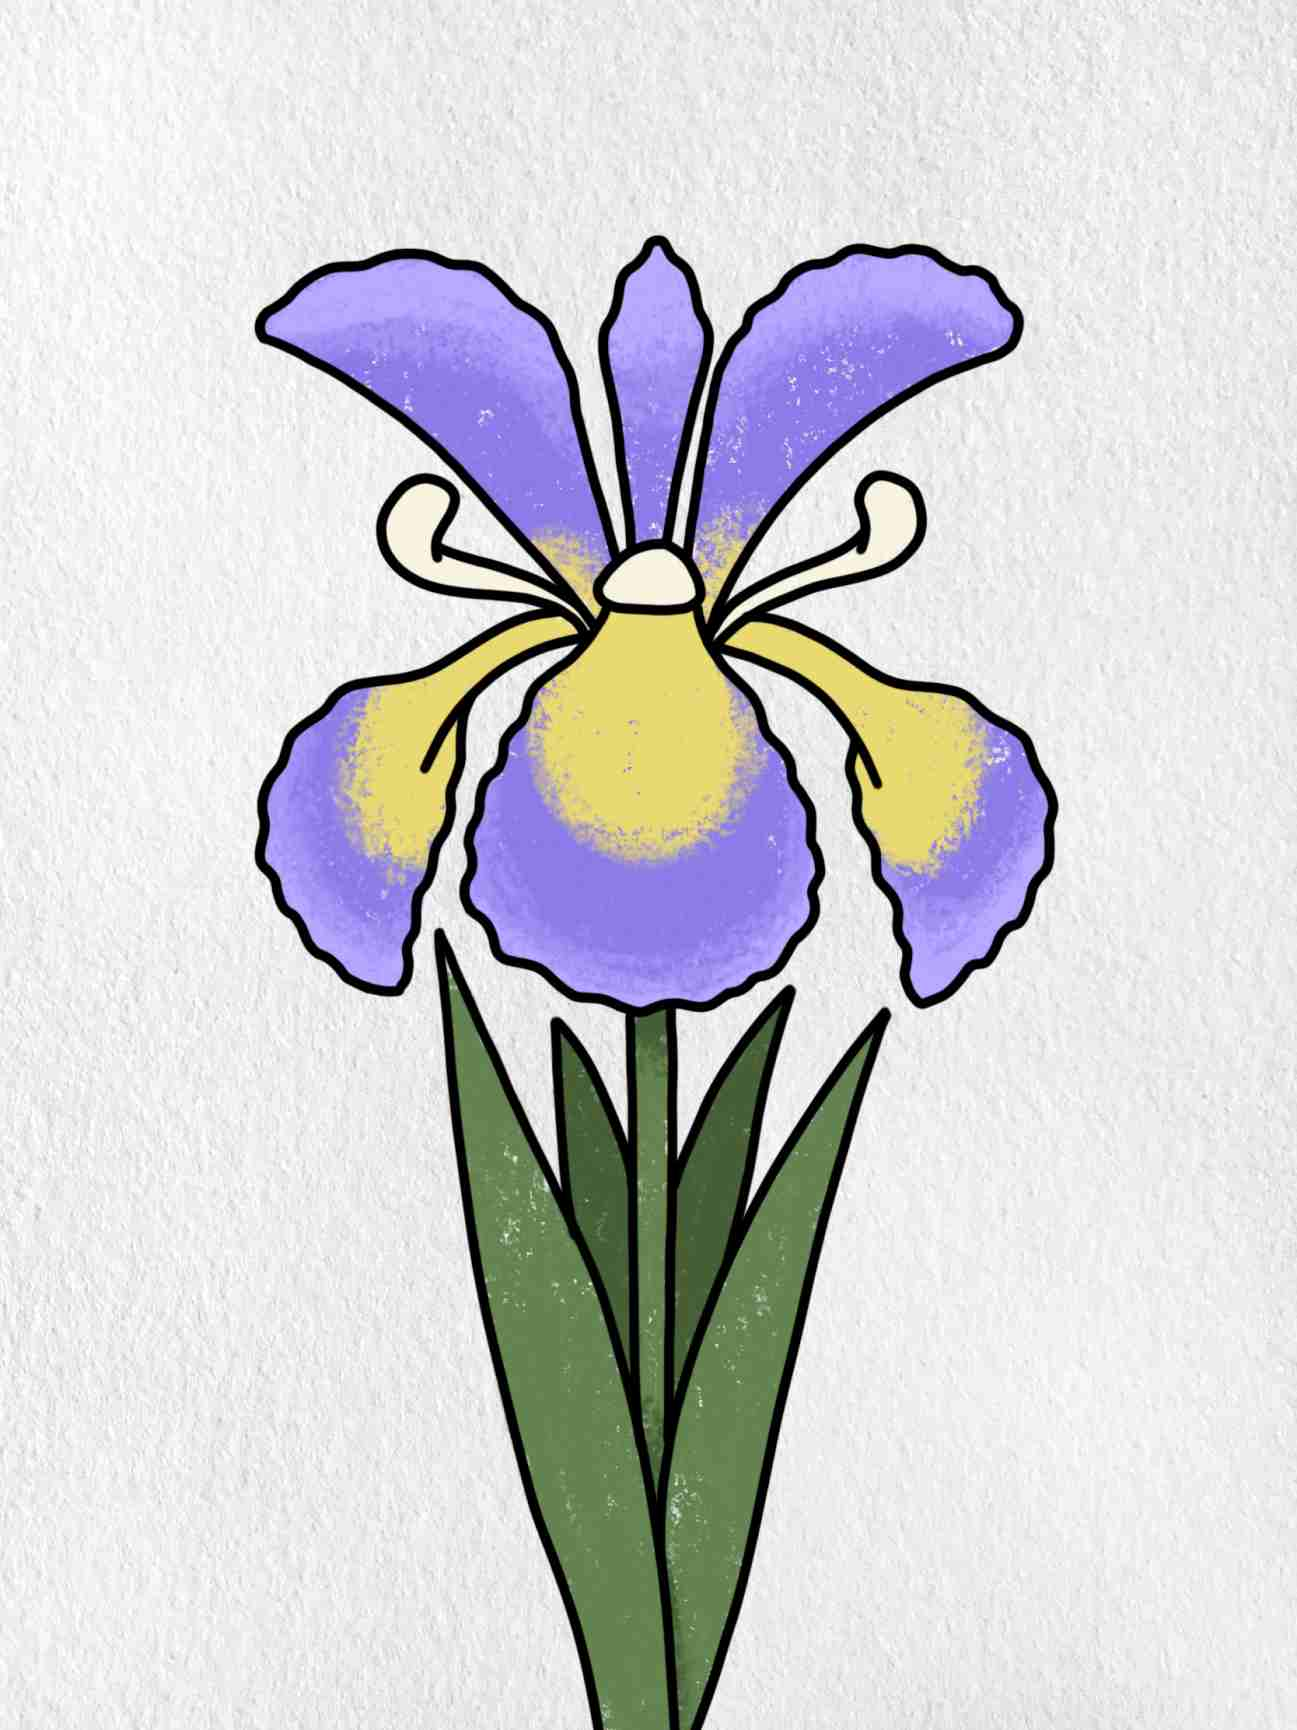 How To Draw An Iris Flower: Step 6